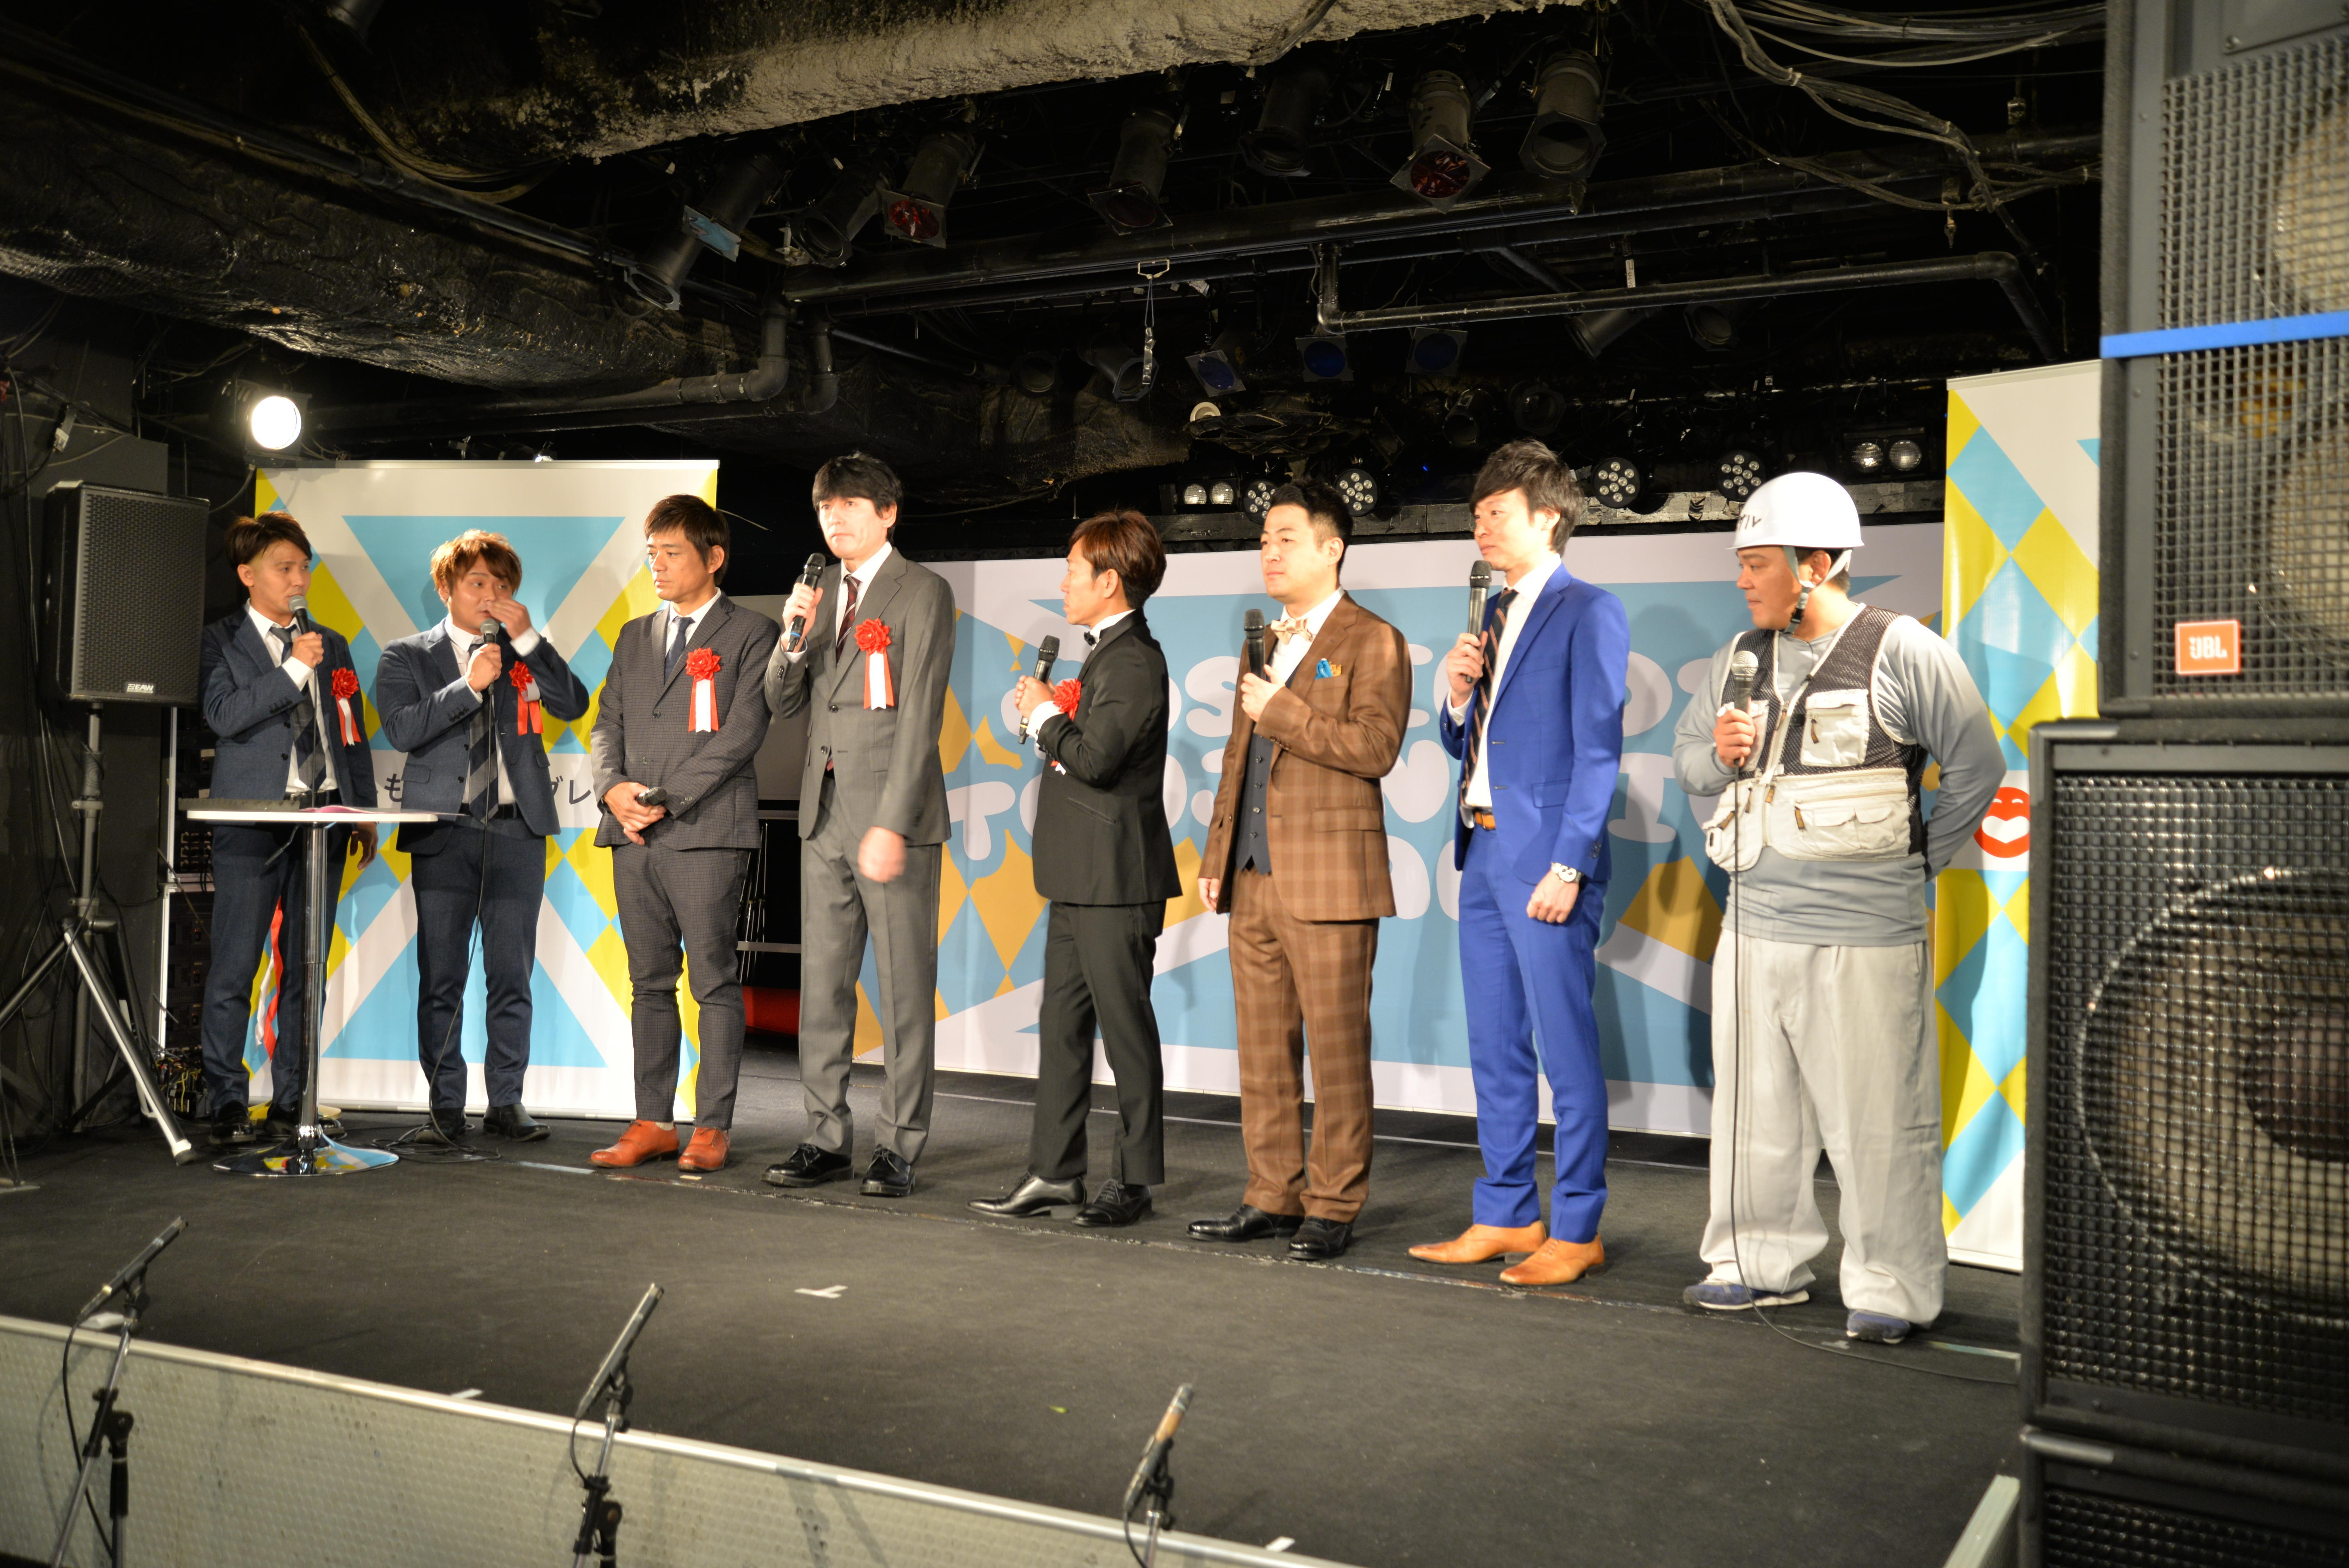 http://news.yoshimoto.co.jp/20180904161912-165c19017d010ae2d31c627e8b6a0d610ff3f48e.jpg